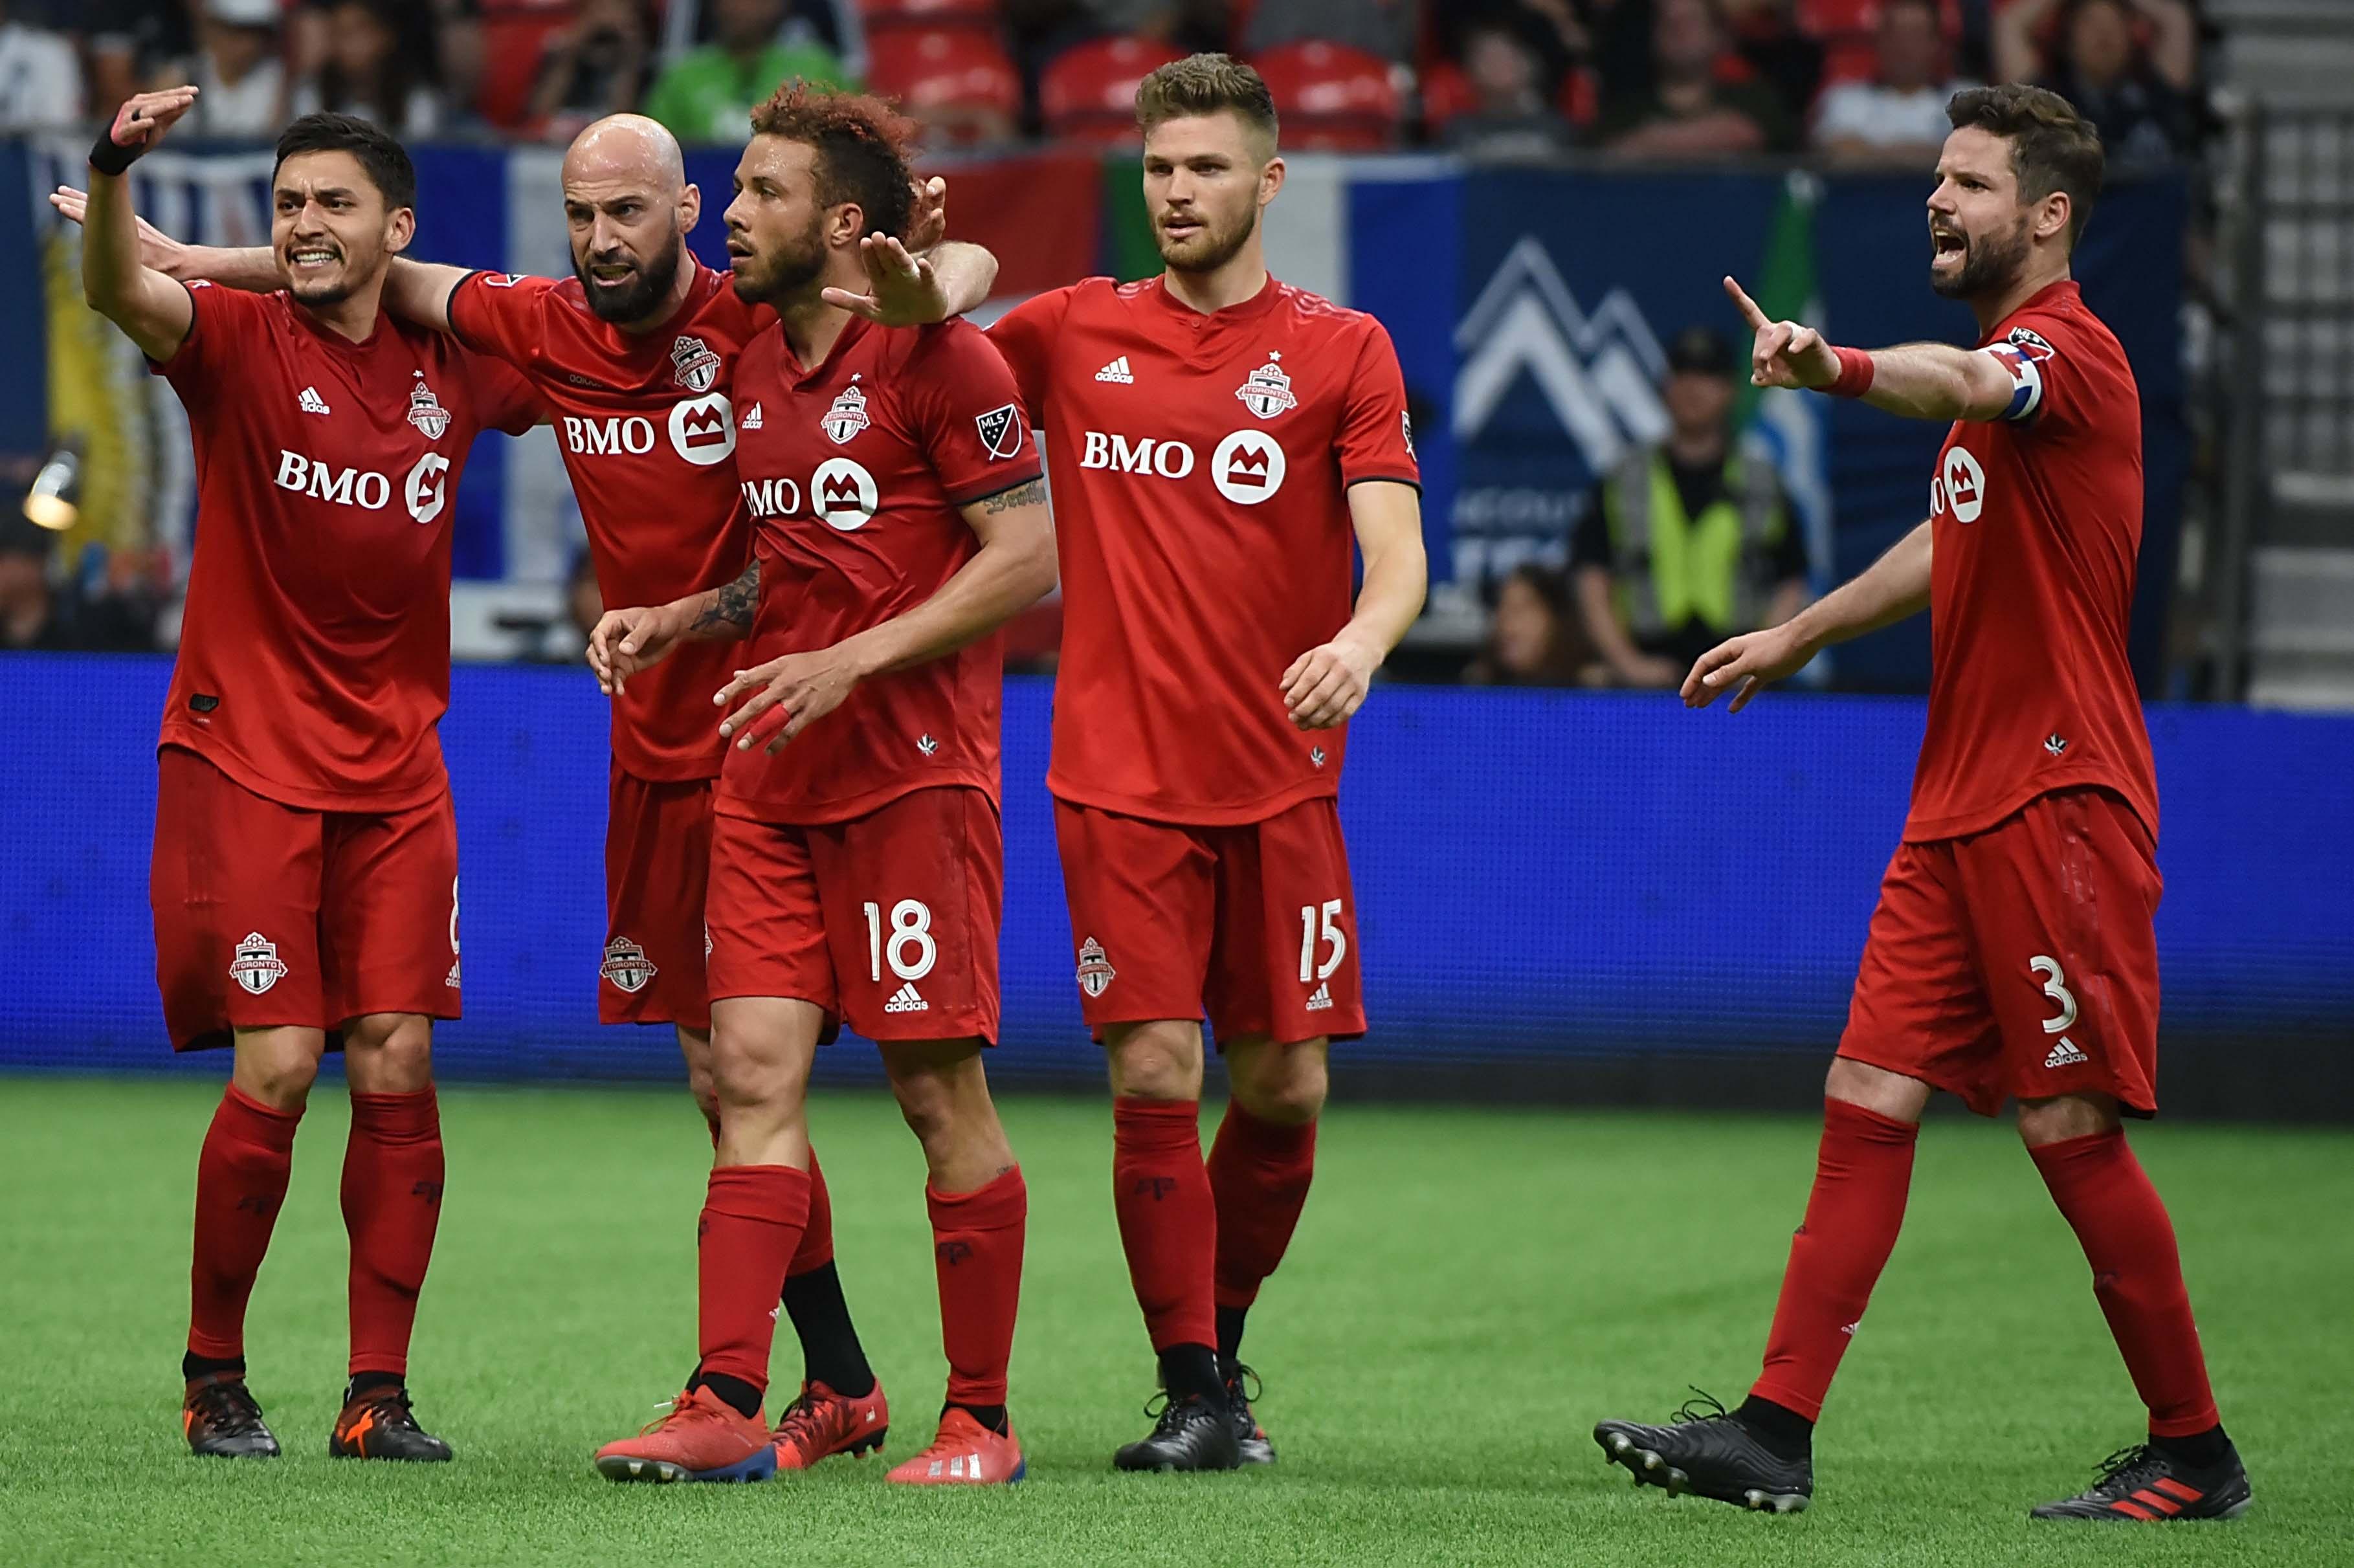 f051b5adcfb Rate the Reds: Toronto FC 1-1 Whitecaps FC